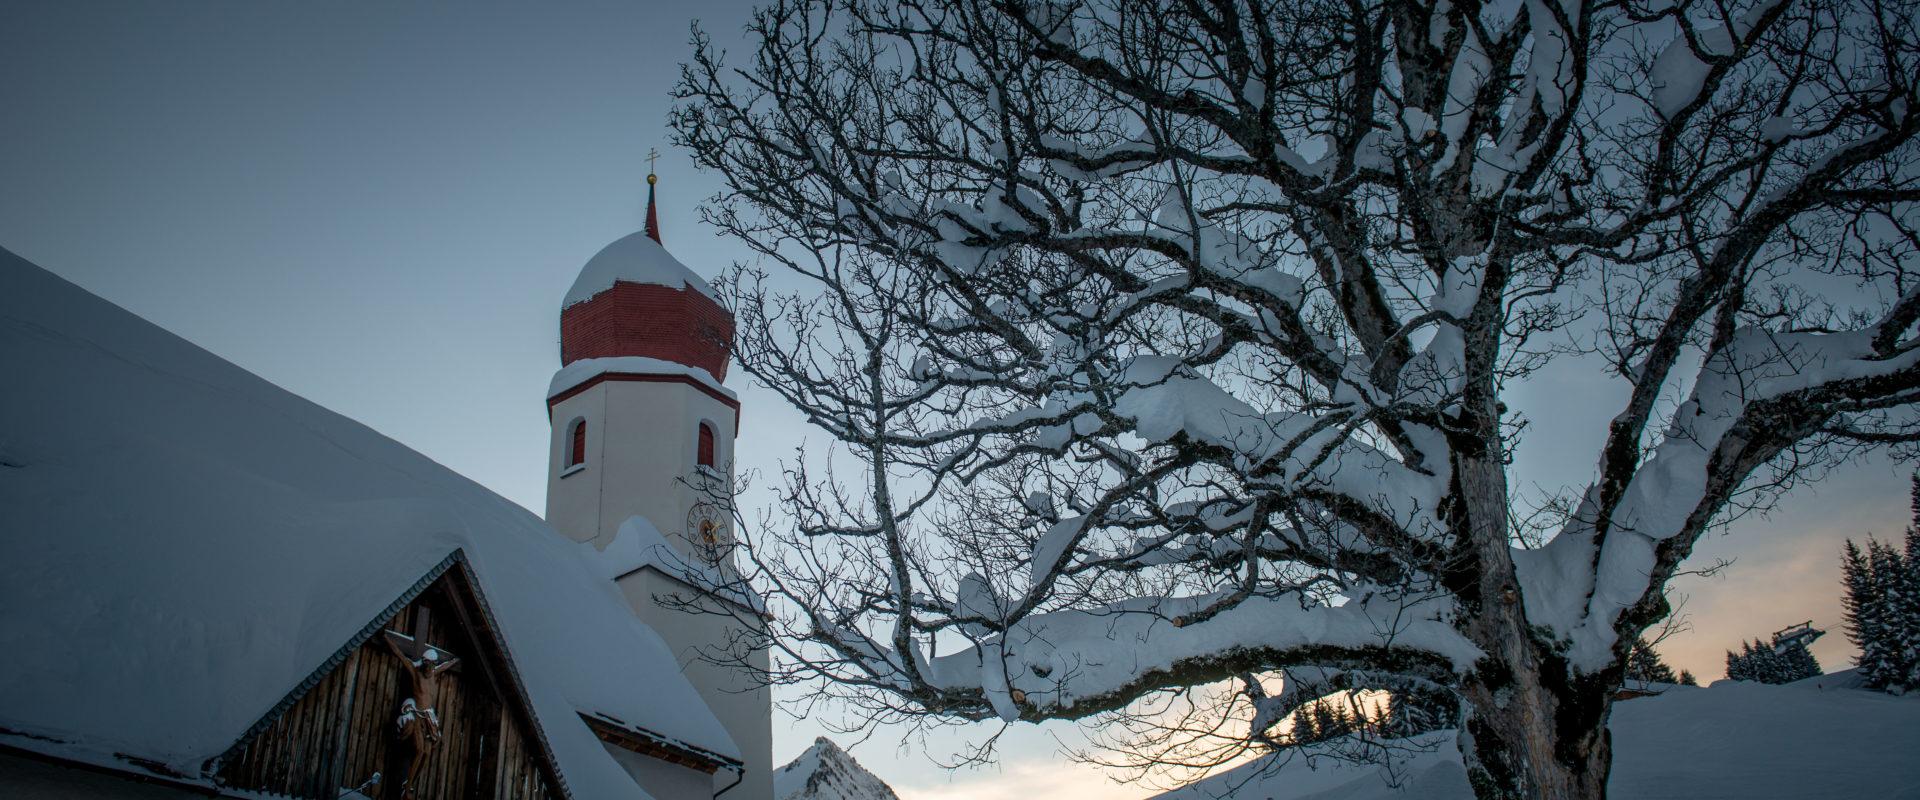 Damülser Kirche im Winter © Huber Images - Damüls-Faschina Tourismus